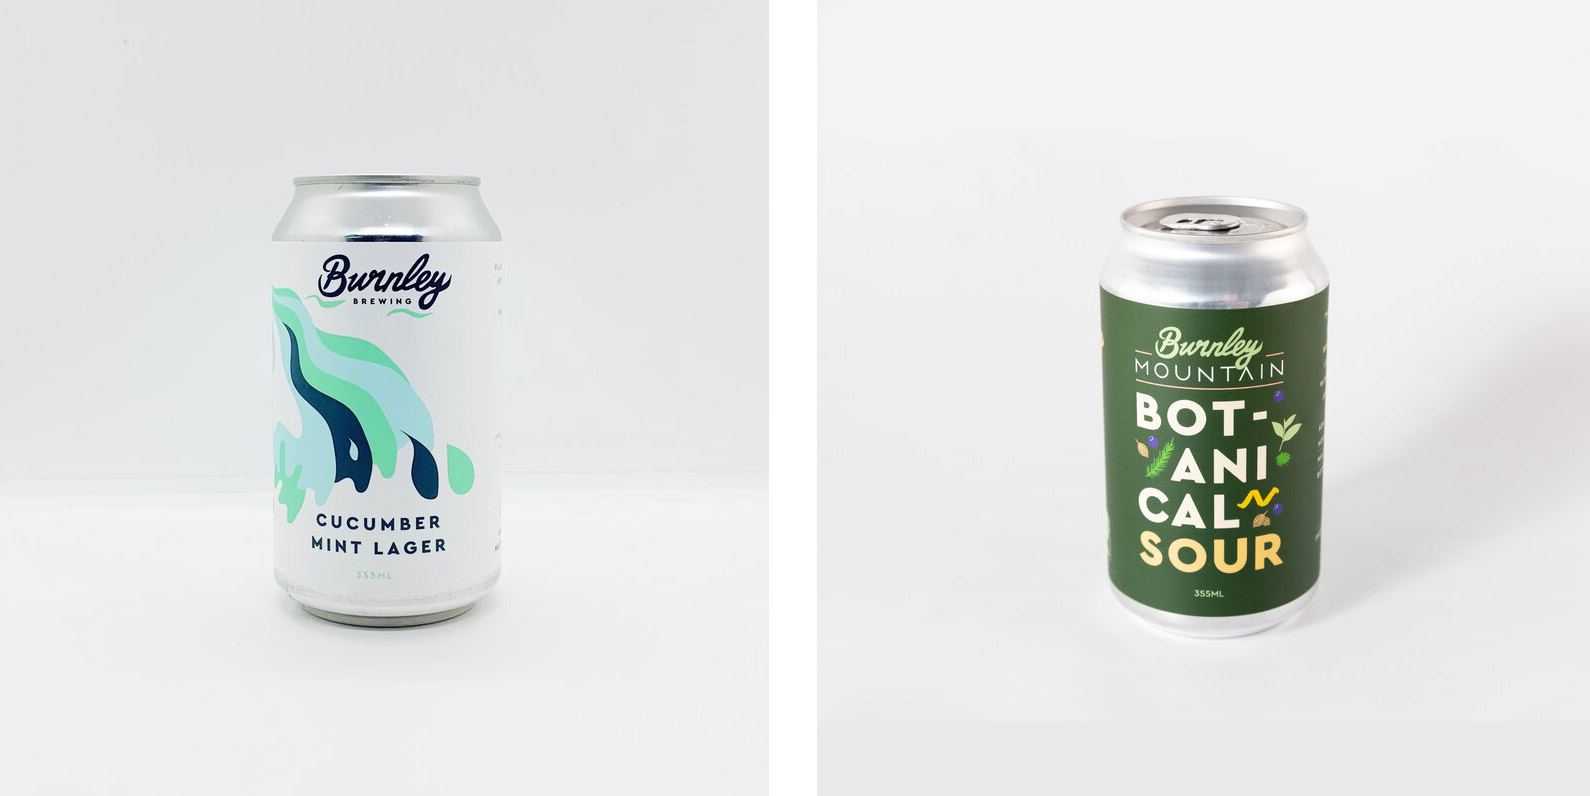 Studio-Mimi-Moon-Design-Burnley-Brewing-Cans-7